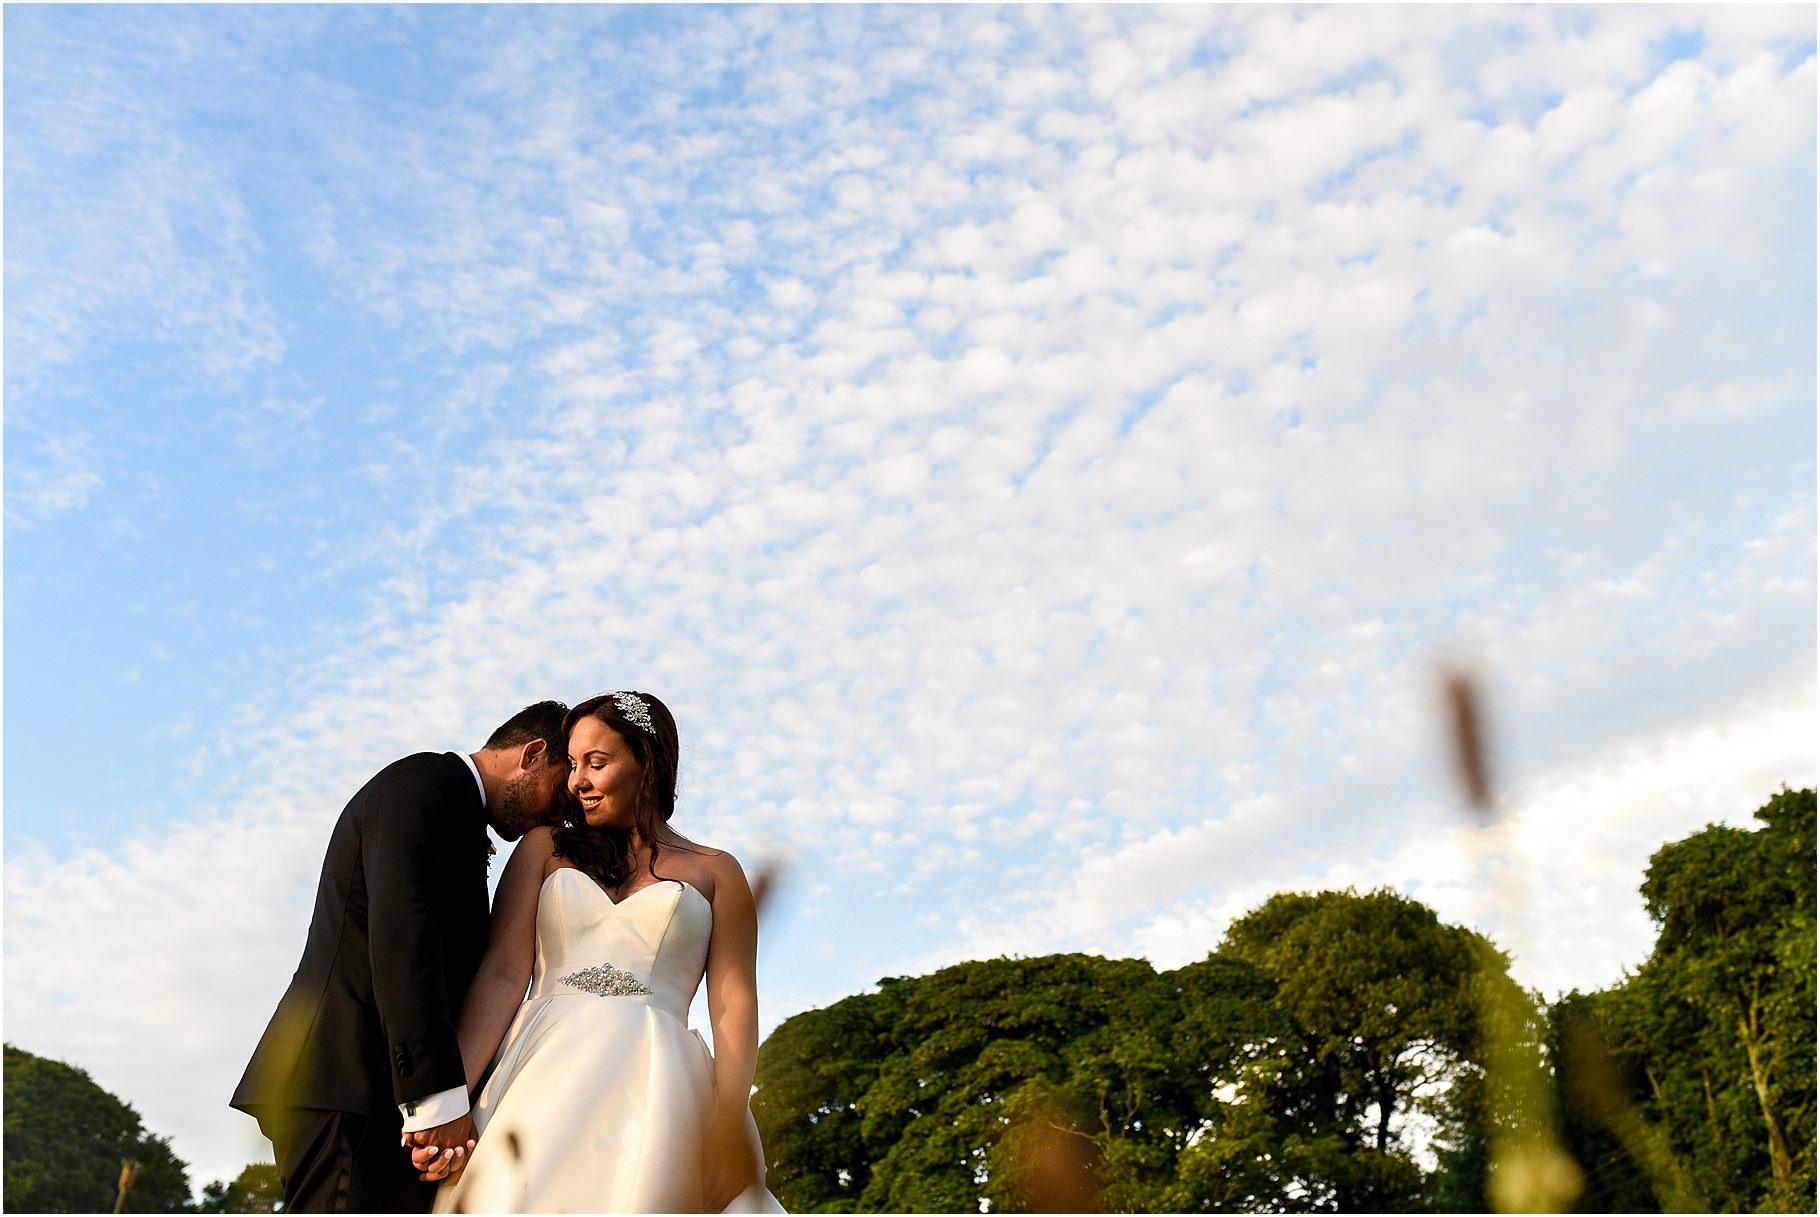 dan-wootton-photography-2017-weddings-123.jpg